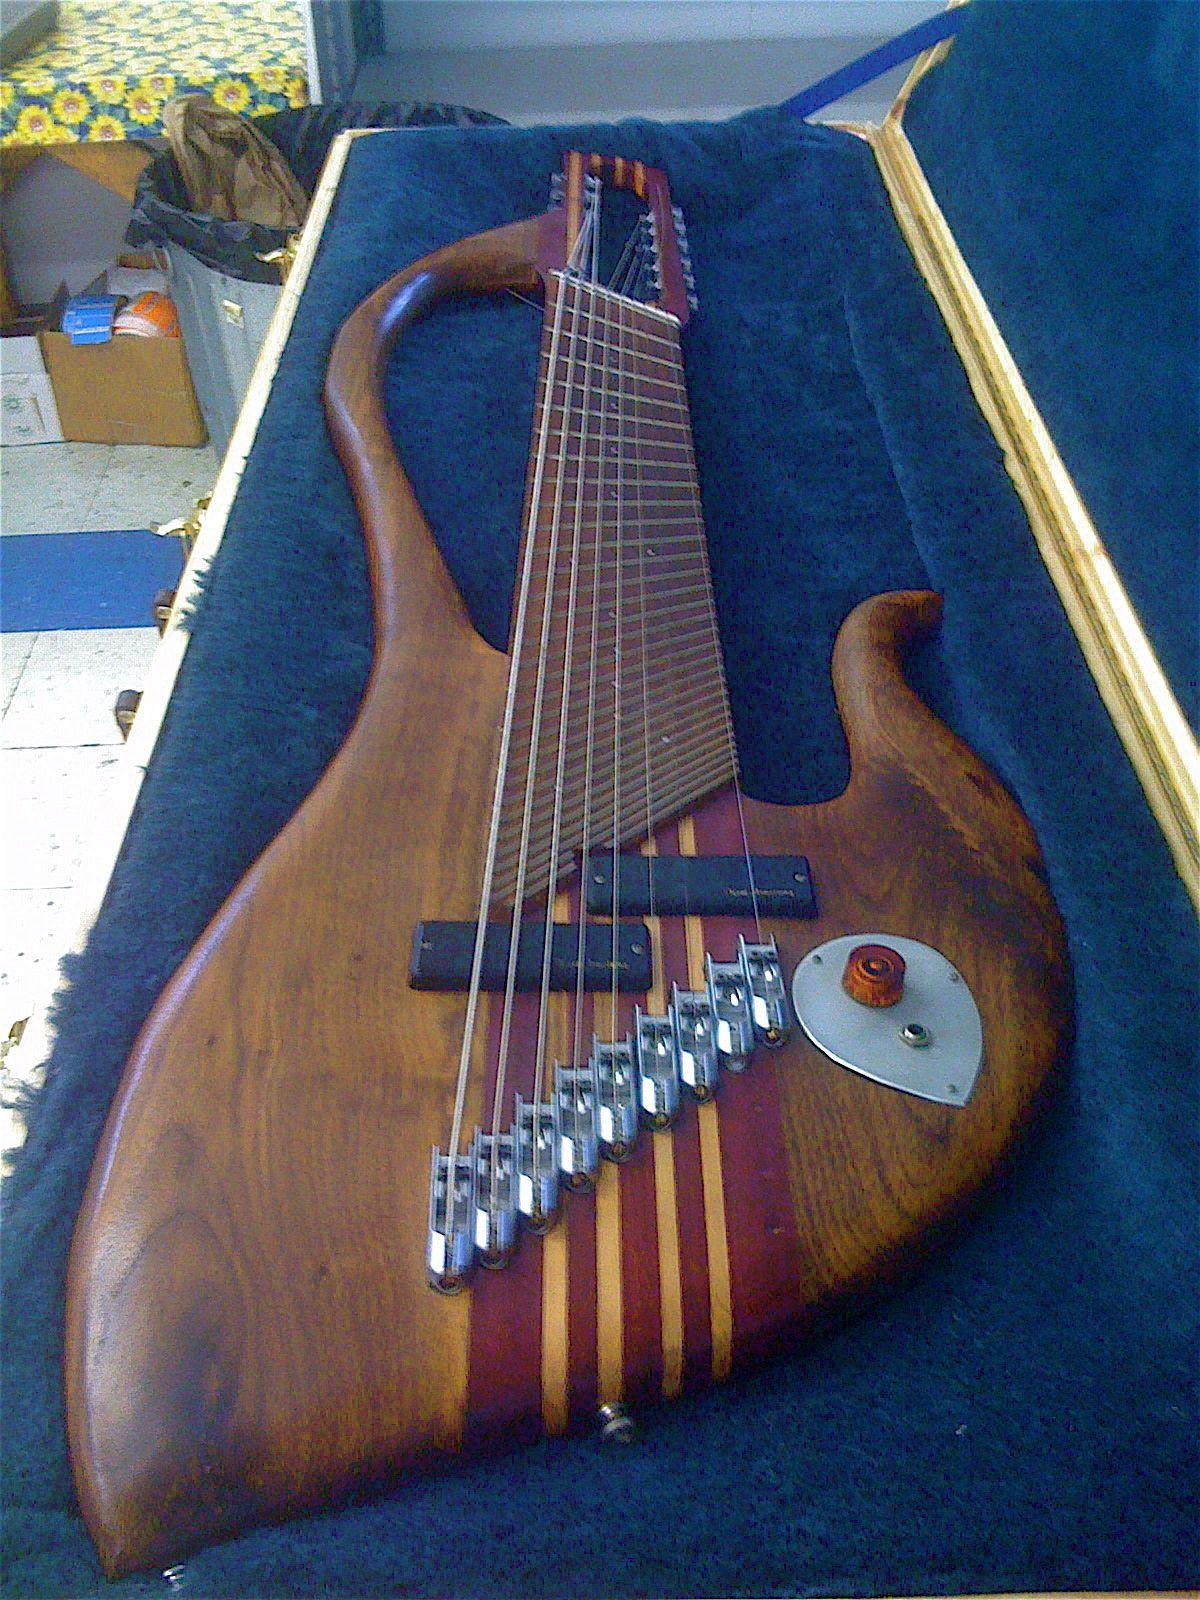 9 nine string bass guitar unique beautiful great sound fanned frets cheap ebay music. Black Bedroom Furniture Sets. Home Design Ideas